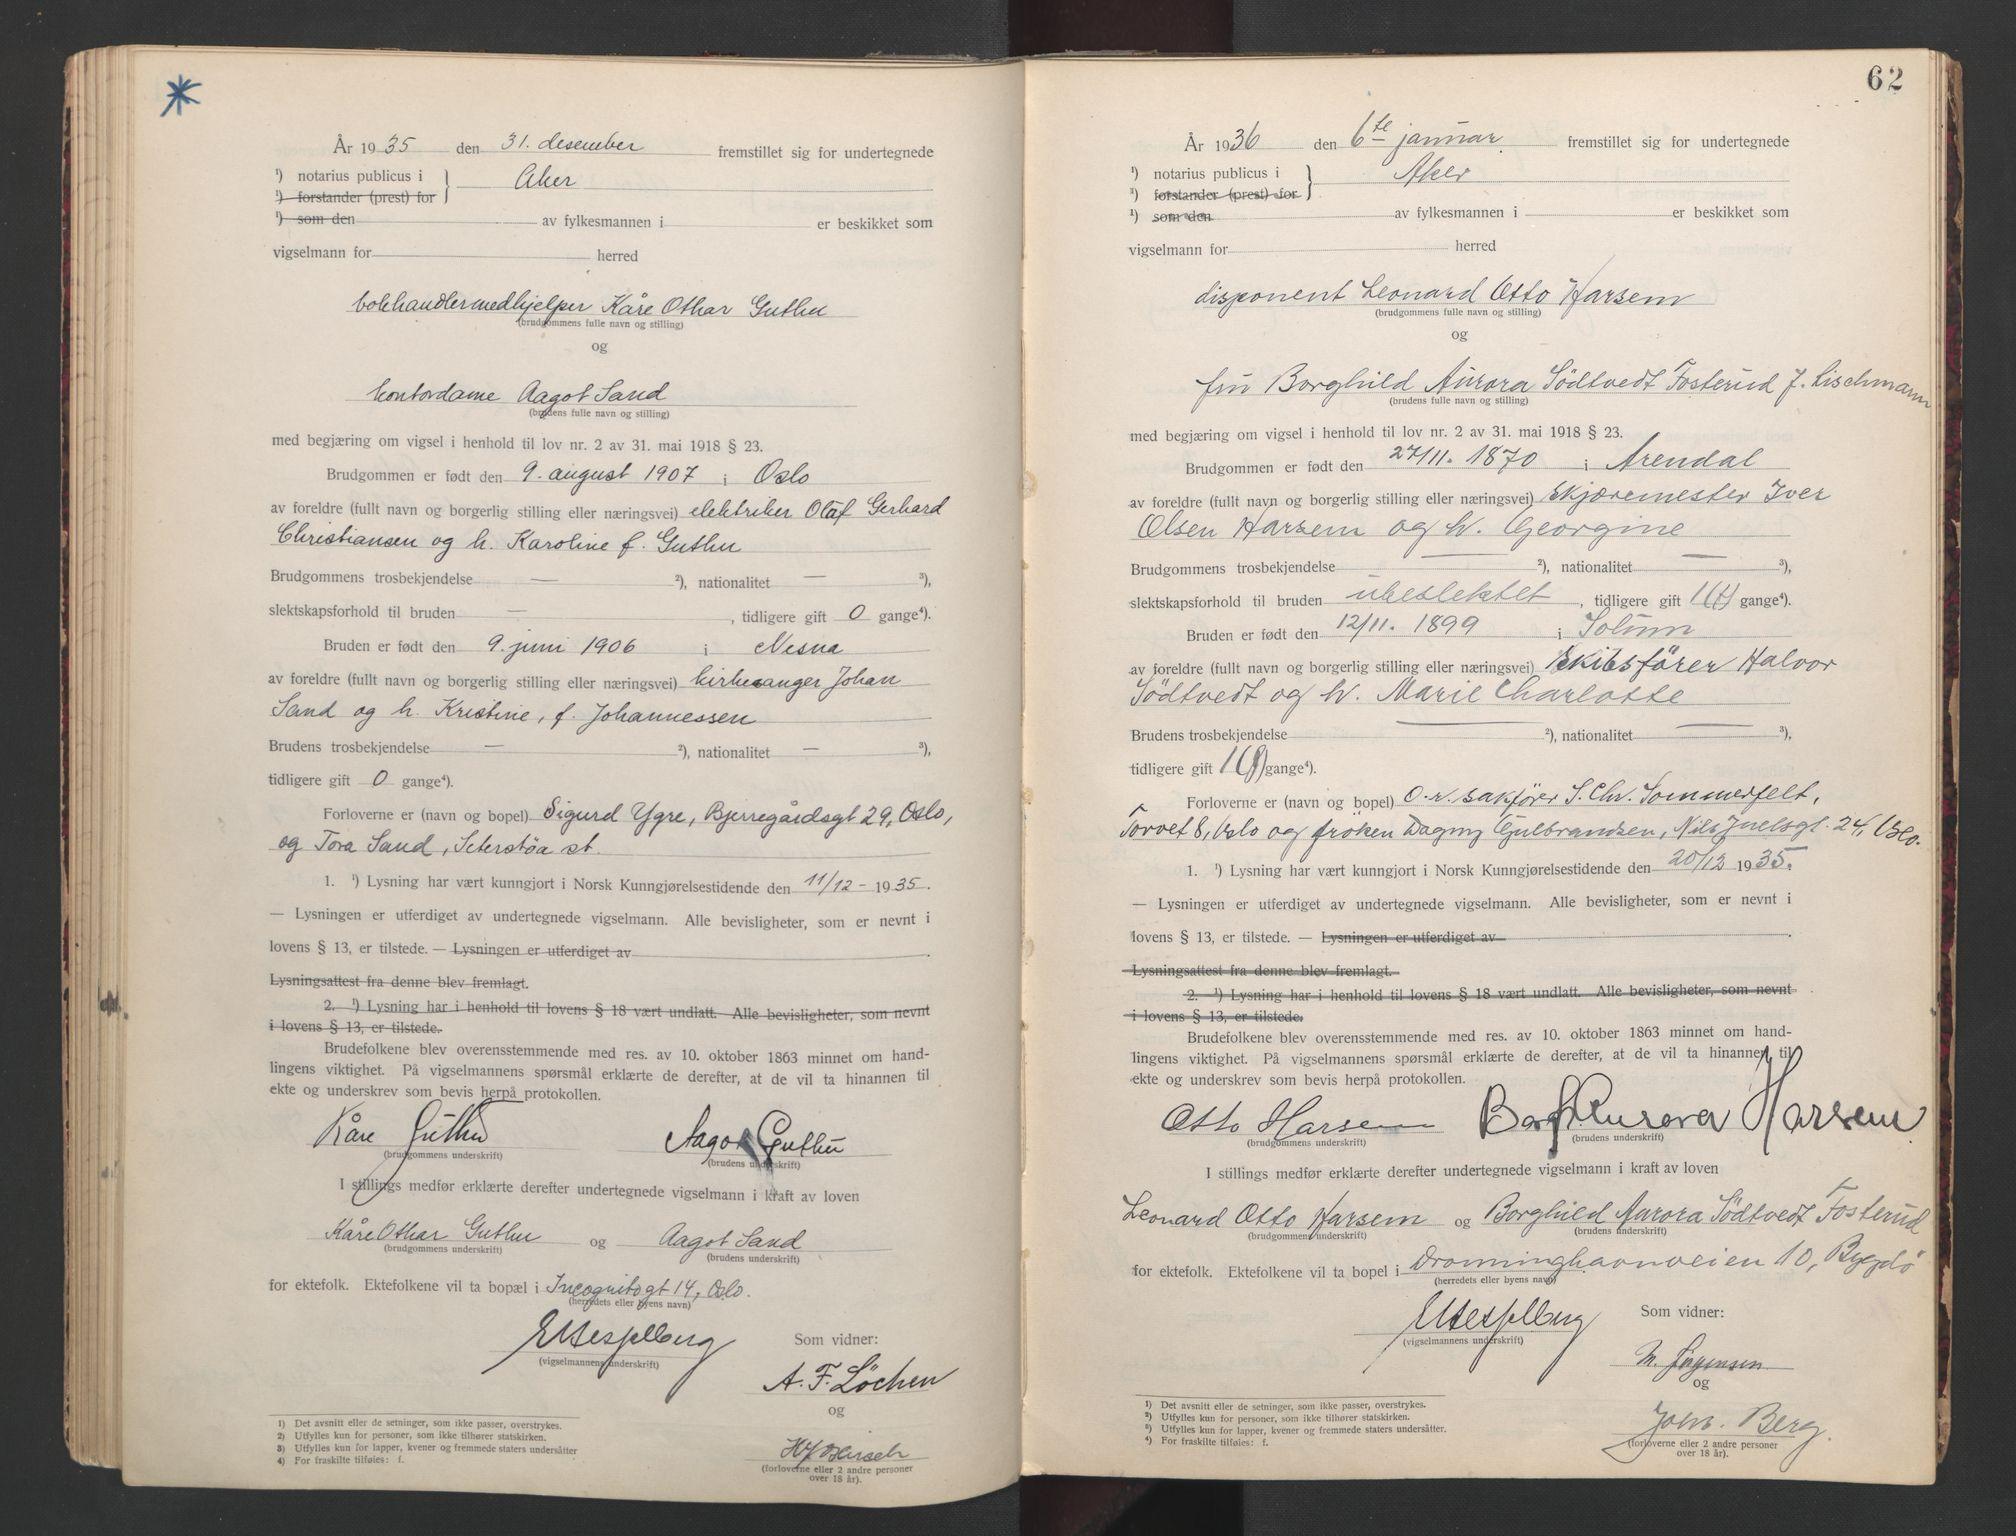 SAO, Aker sorenskriveri, L/Lc/Lcb/L0008: Vigselprotokoll, 1935-1936, s. 62